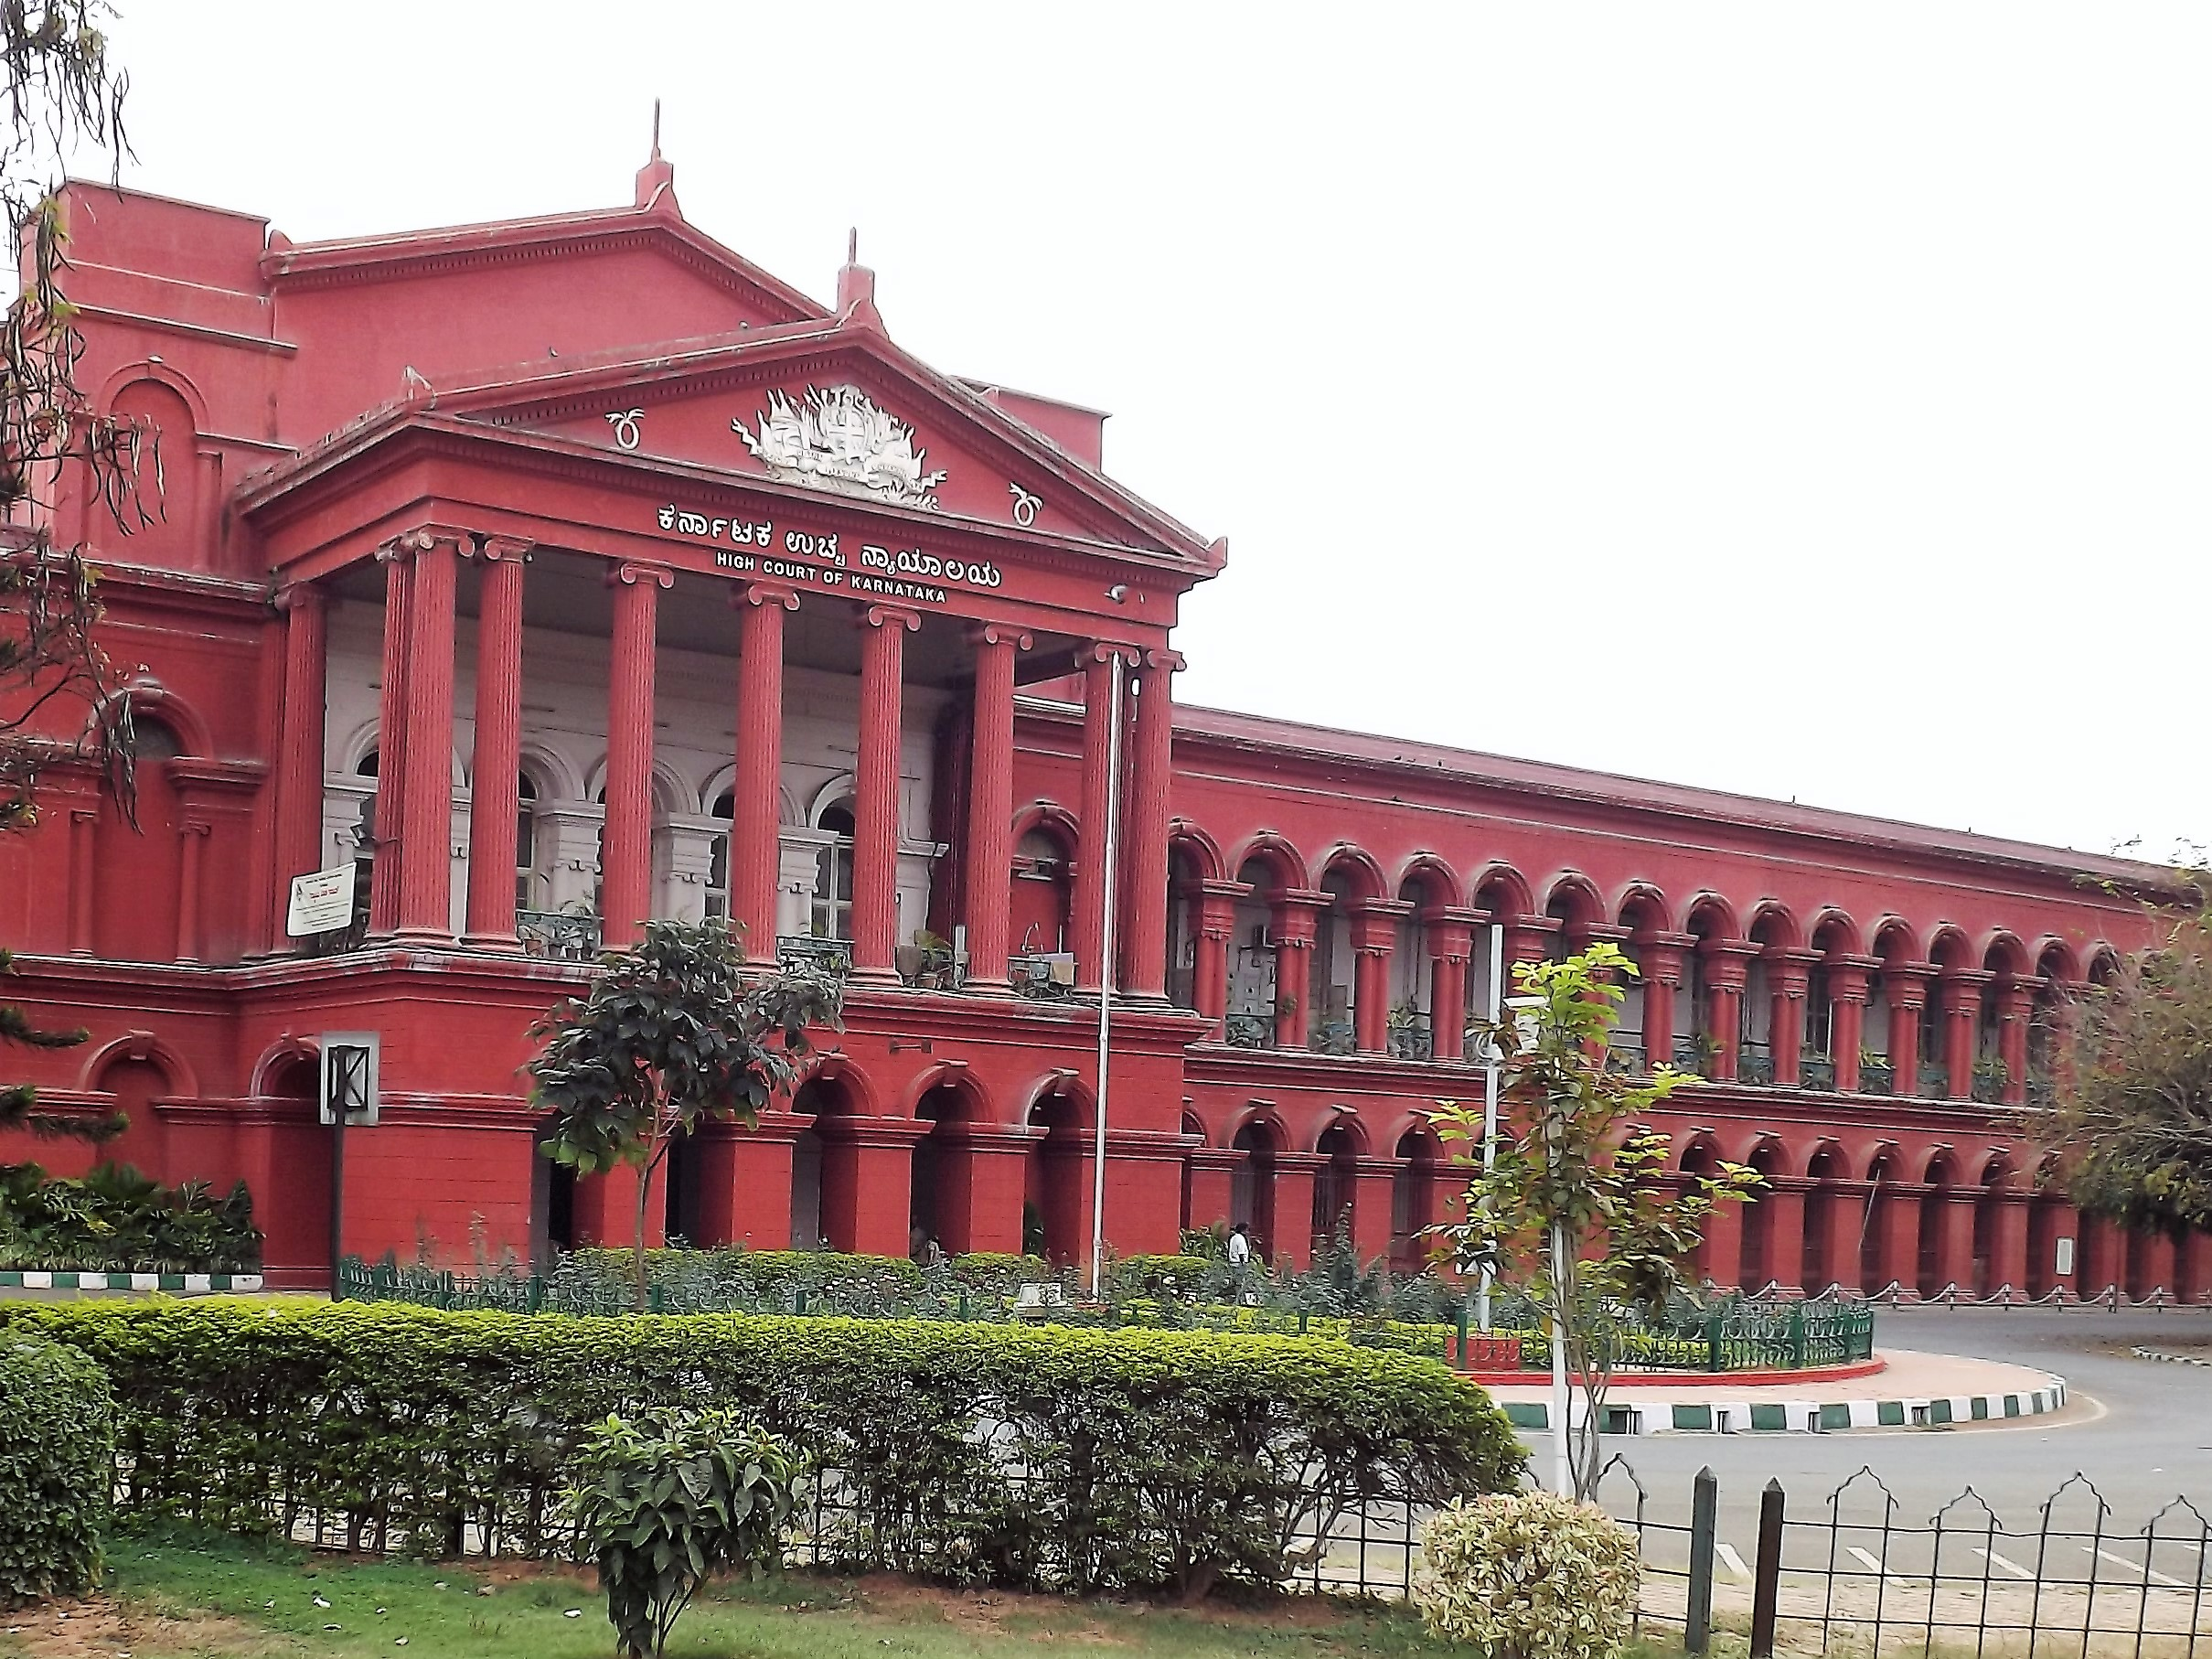 Bangalore high court building